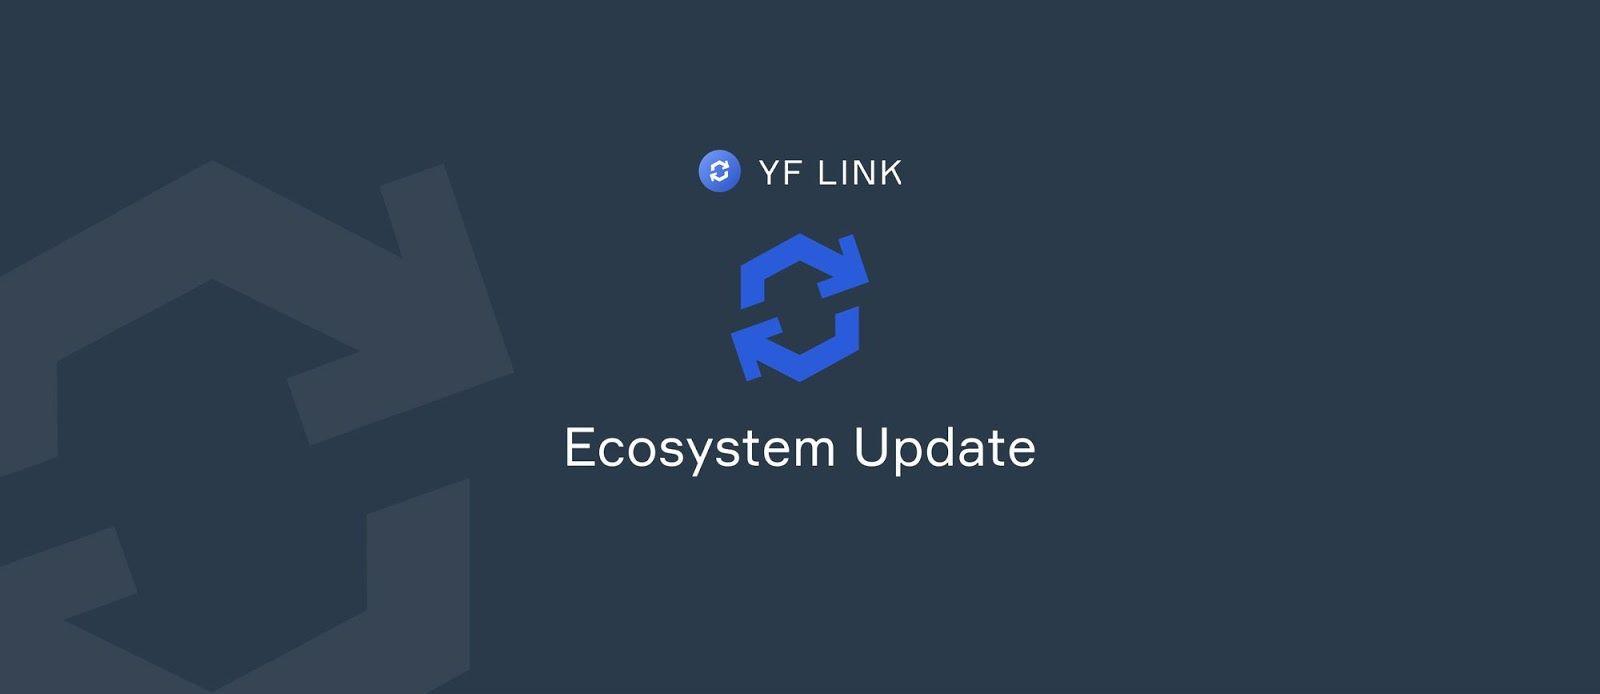 YF Link Roadmap: LINKSWAP Development, Chainlink Grant Application, and More